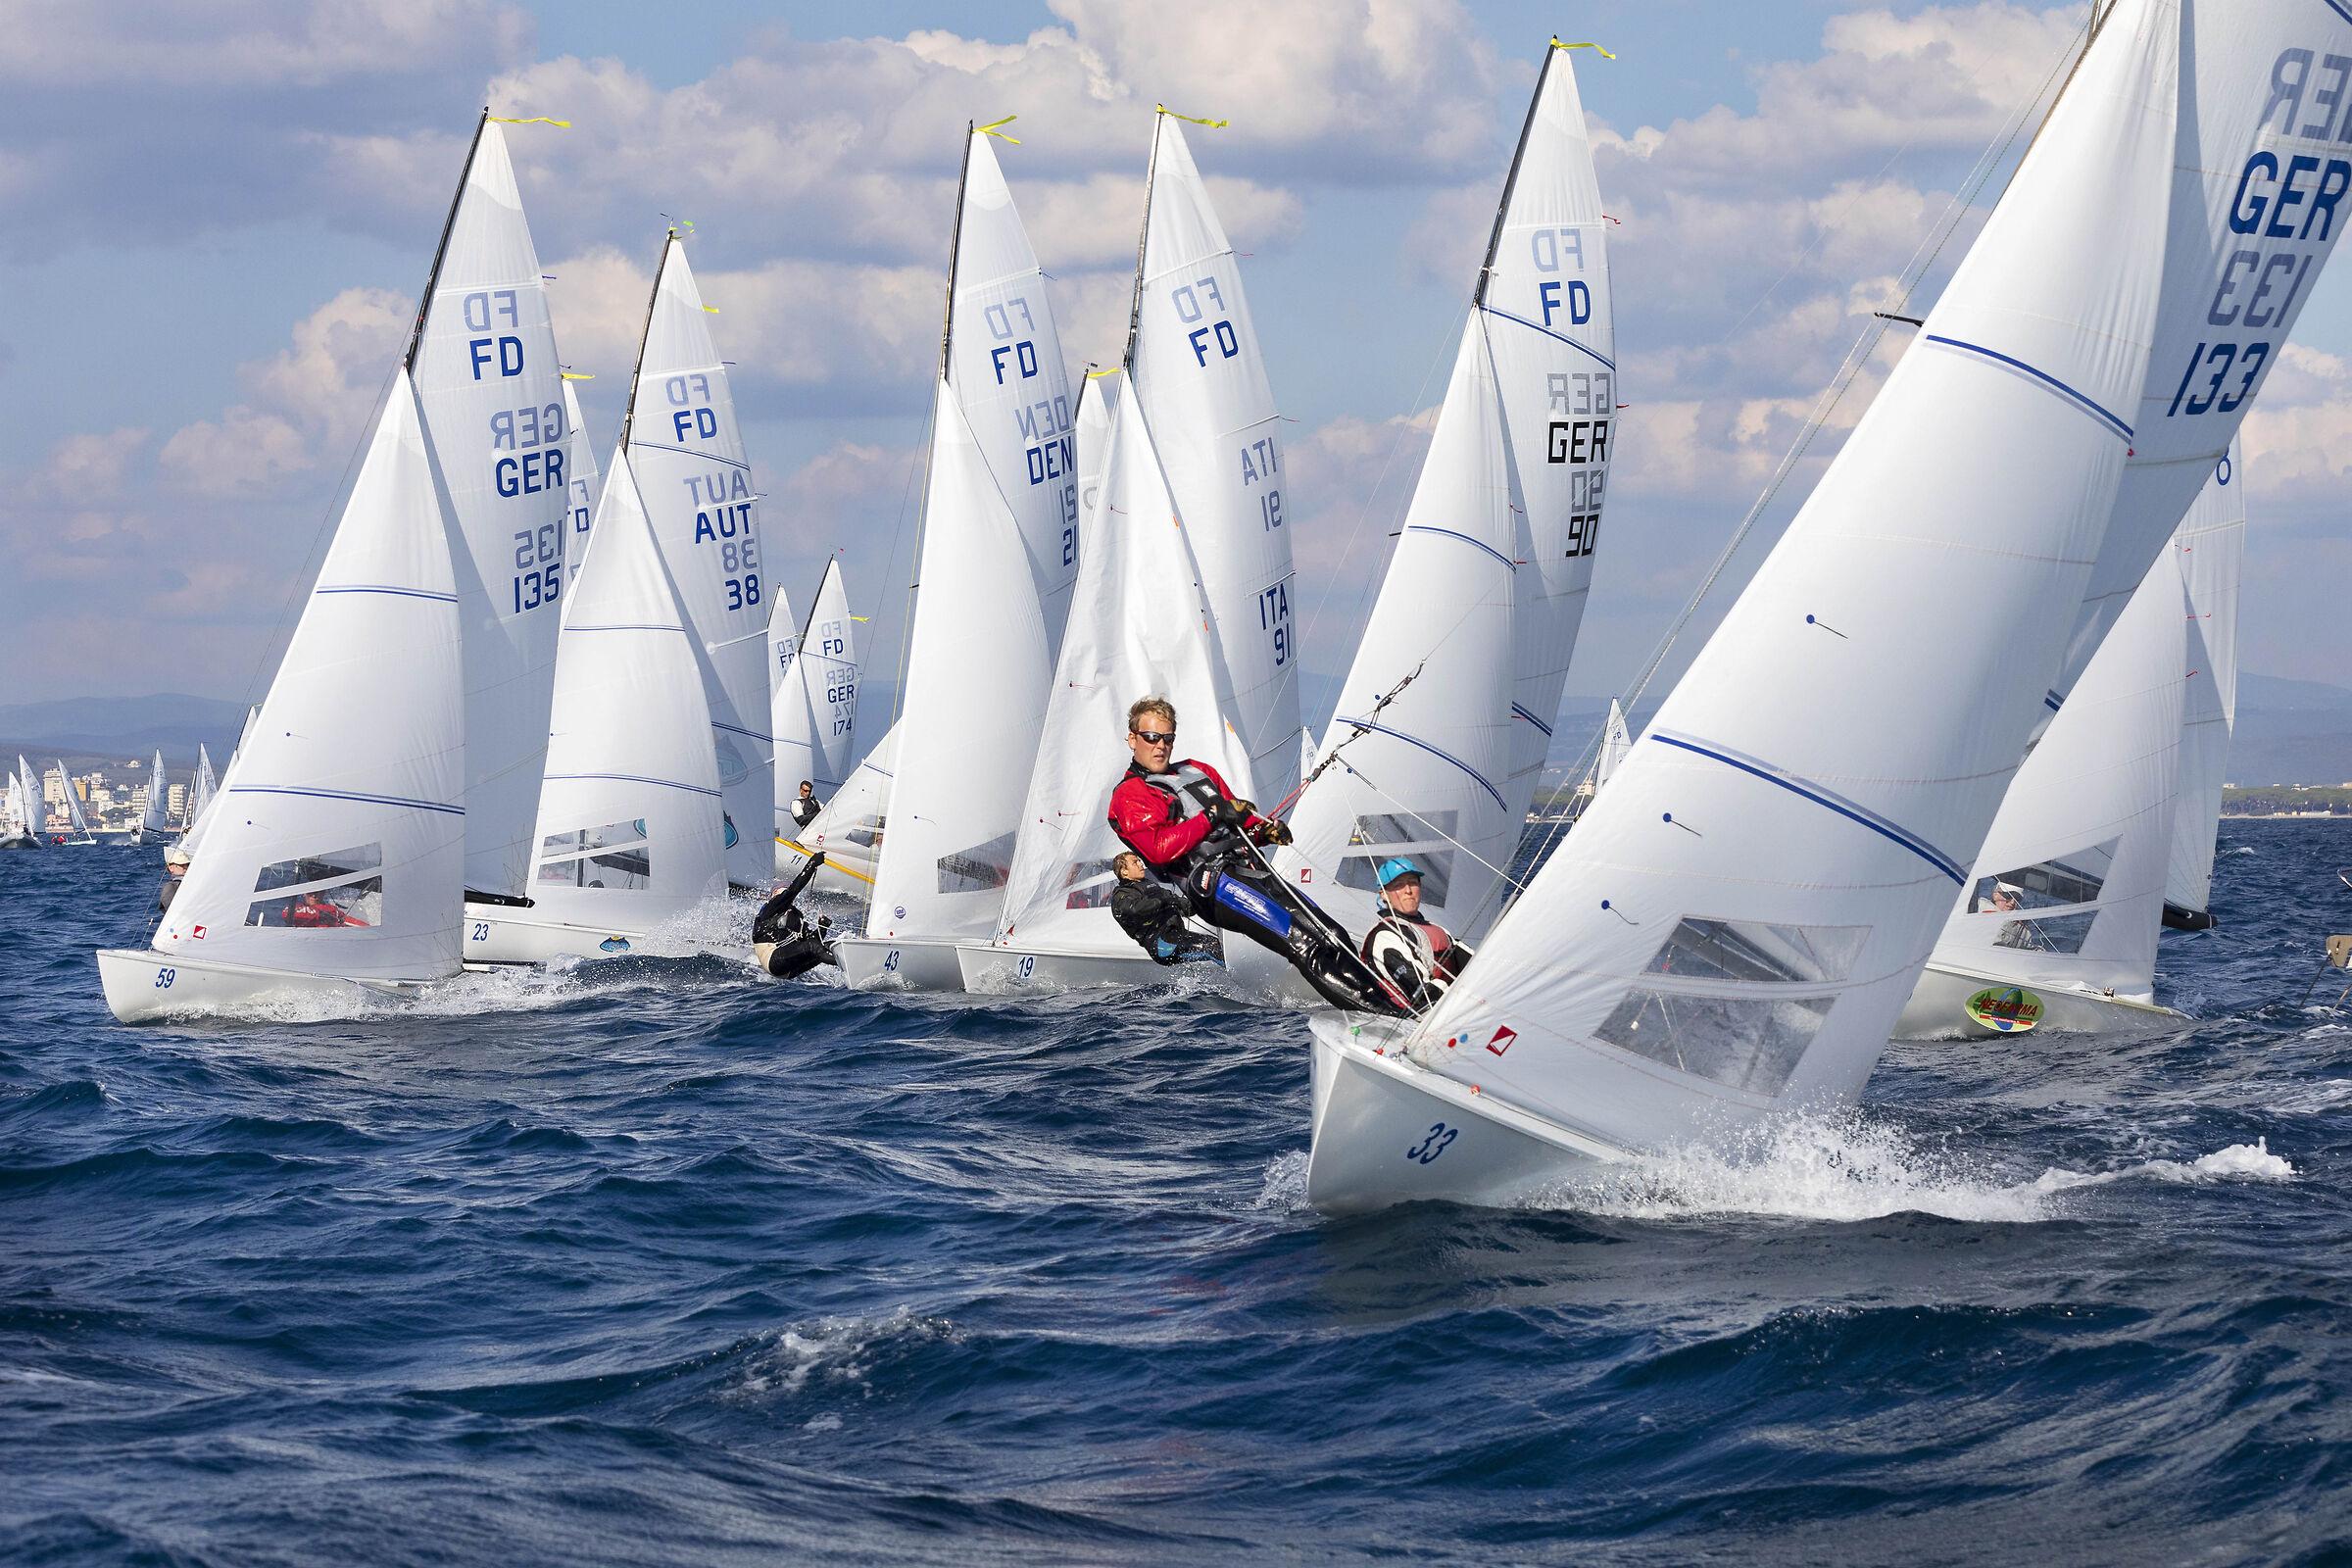 Flying Dutchman World Championship...